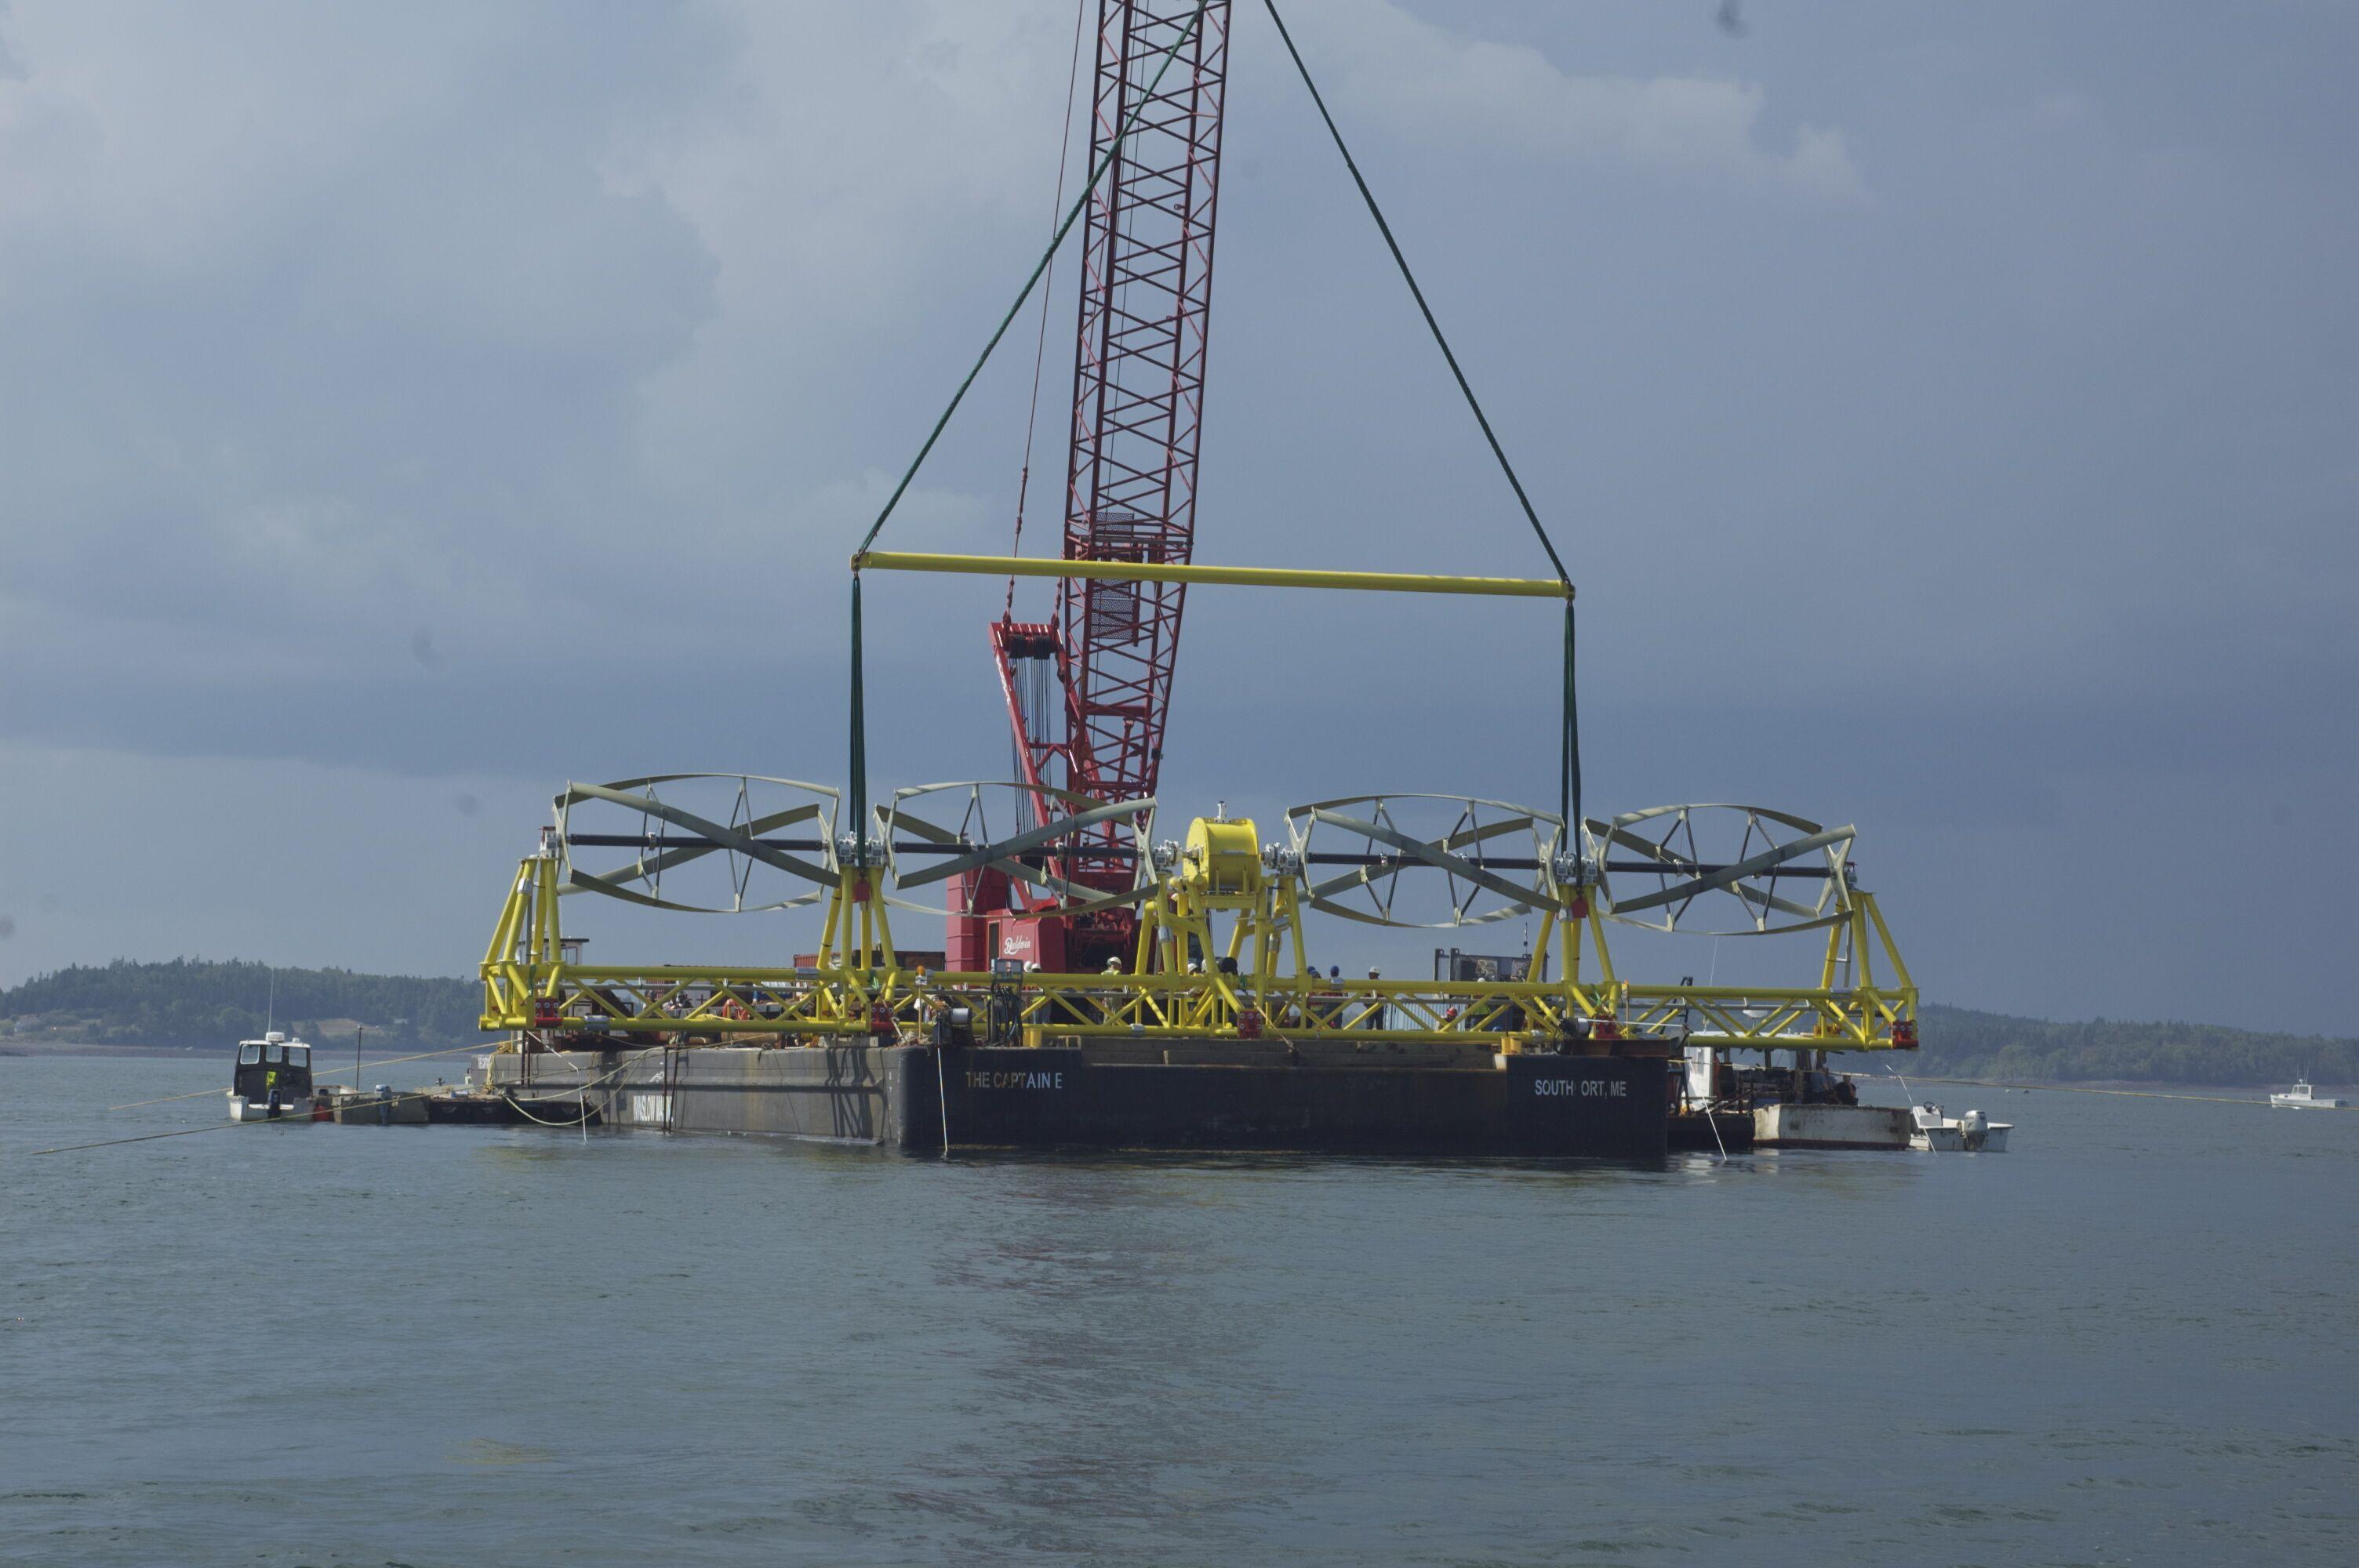 tidal energy conversion system pdf